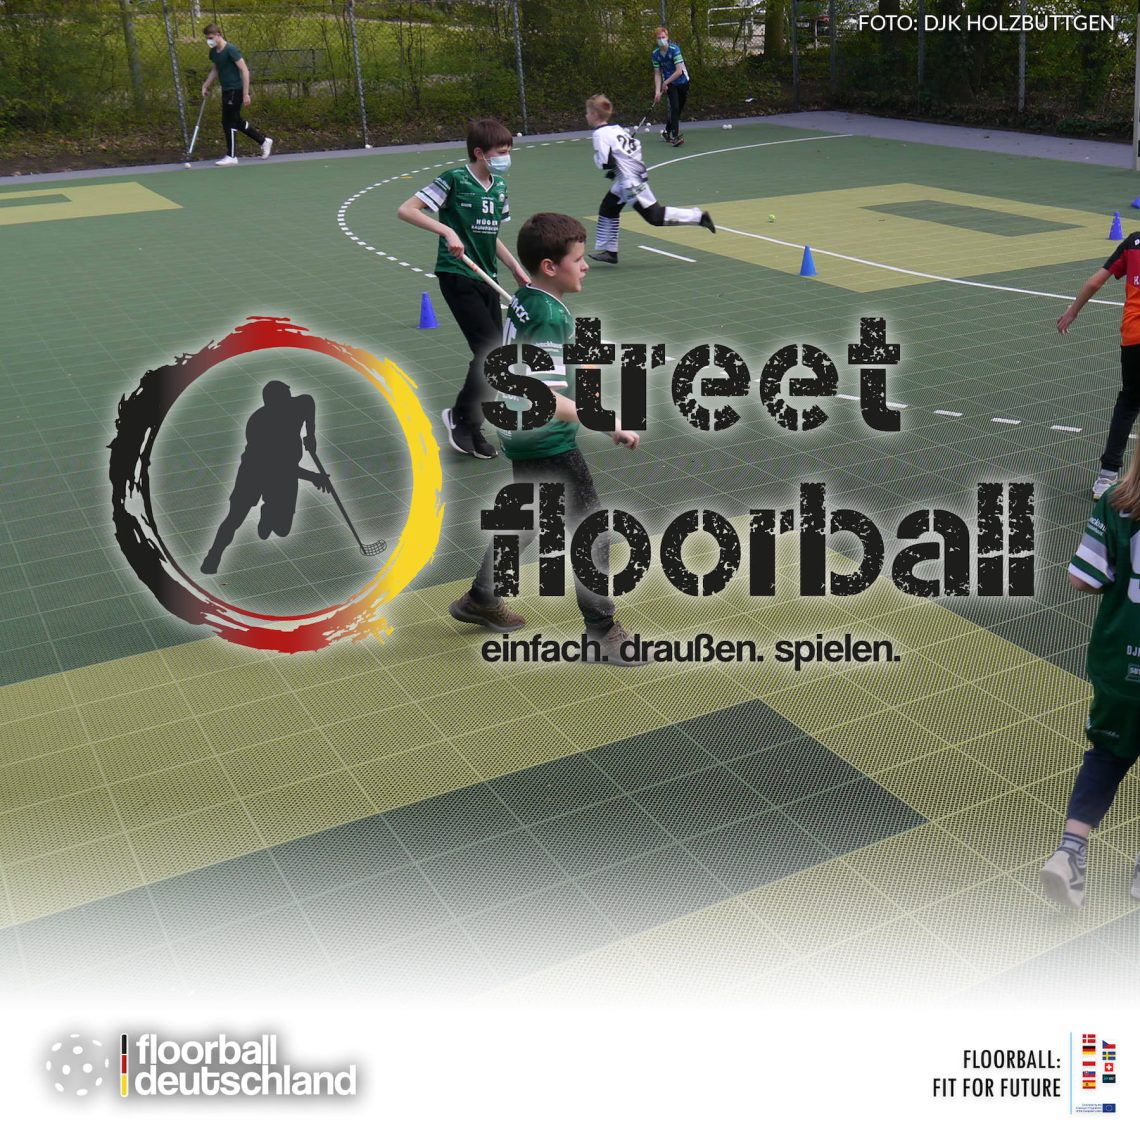 5. Street Floorball Meeting stößt auf große Resonanz